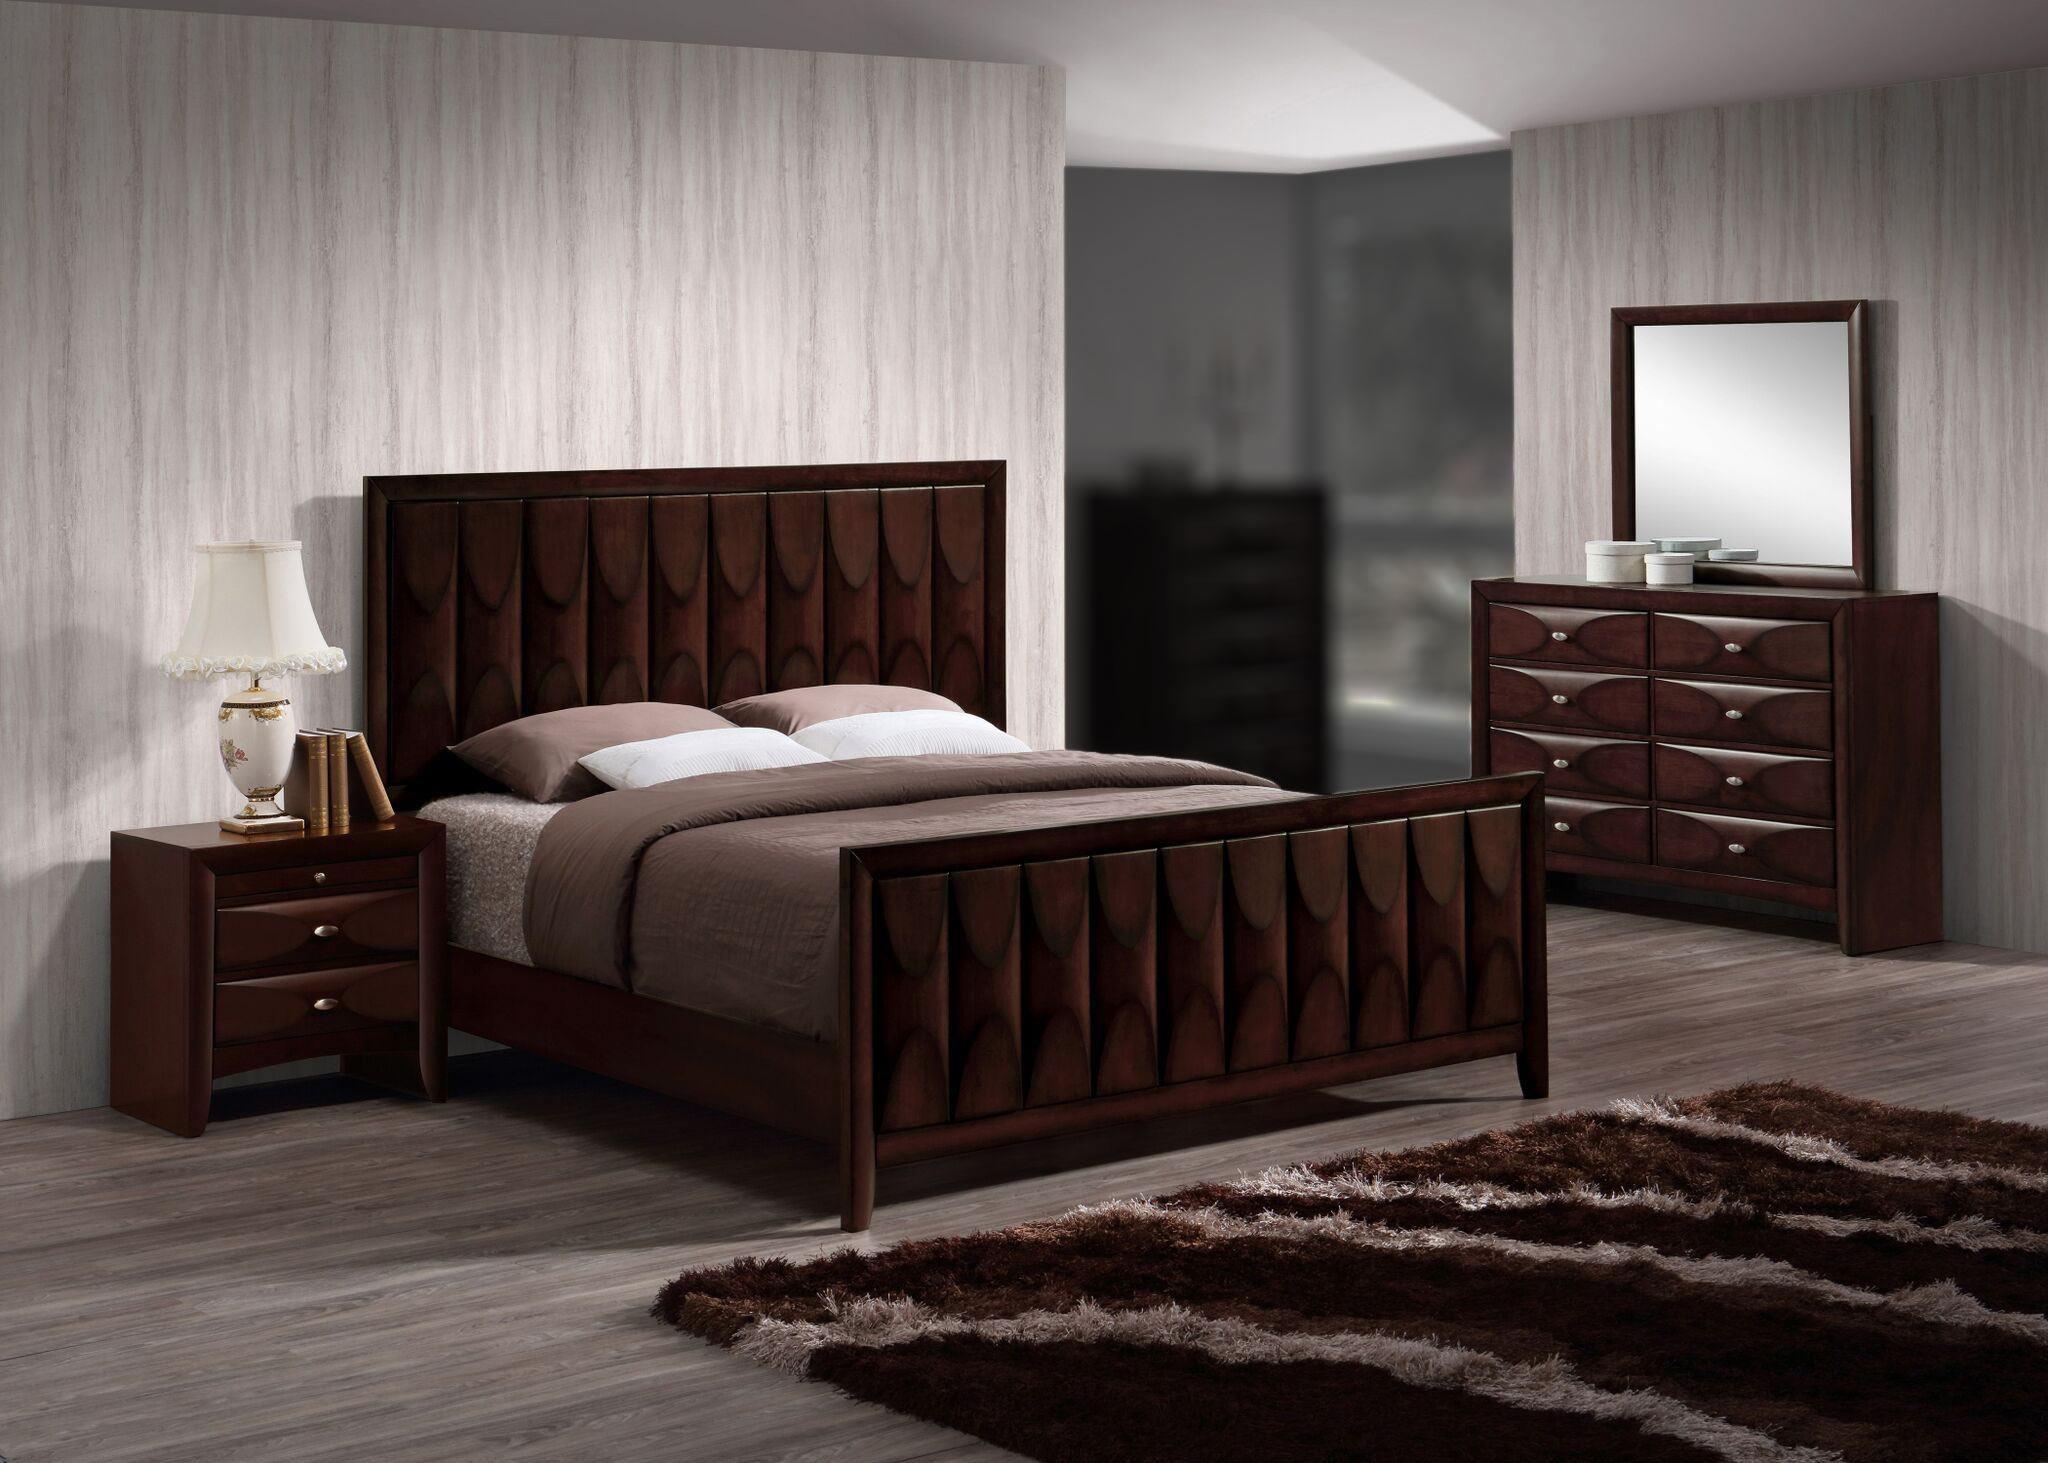 Lifestyle Banfield 4PC King Bedroom Set - Item Number: 6181B-4PC-KBR